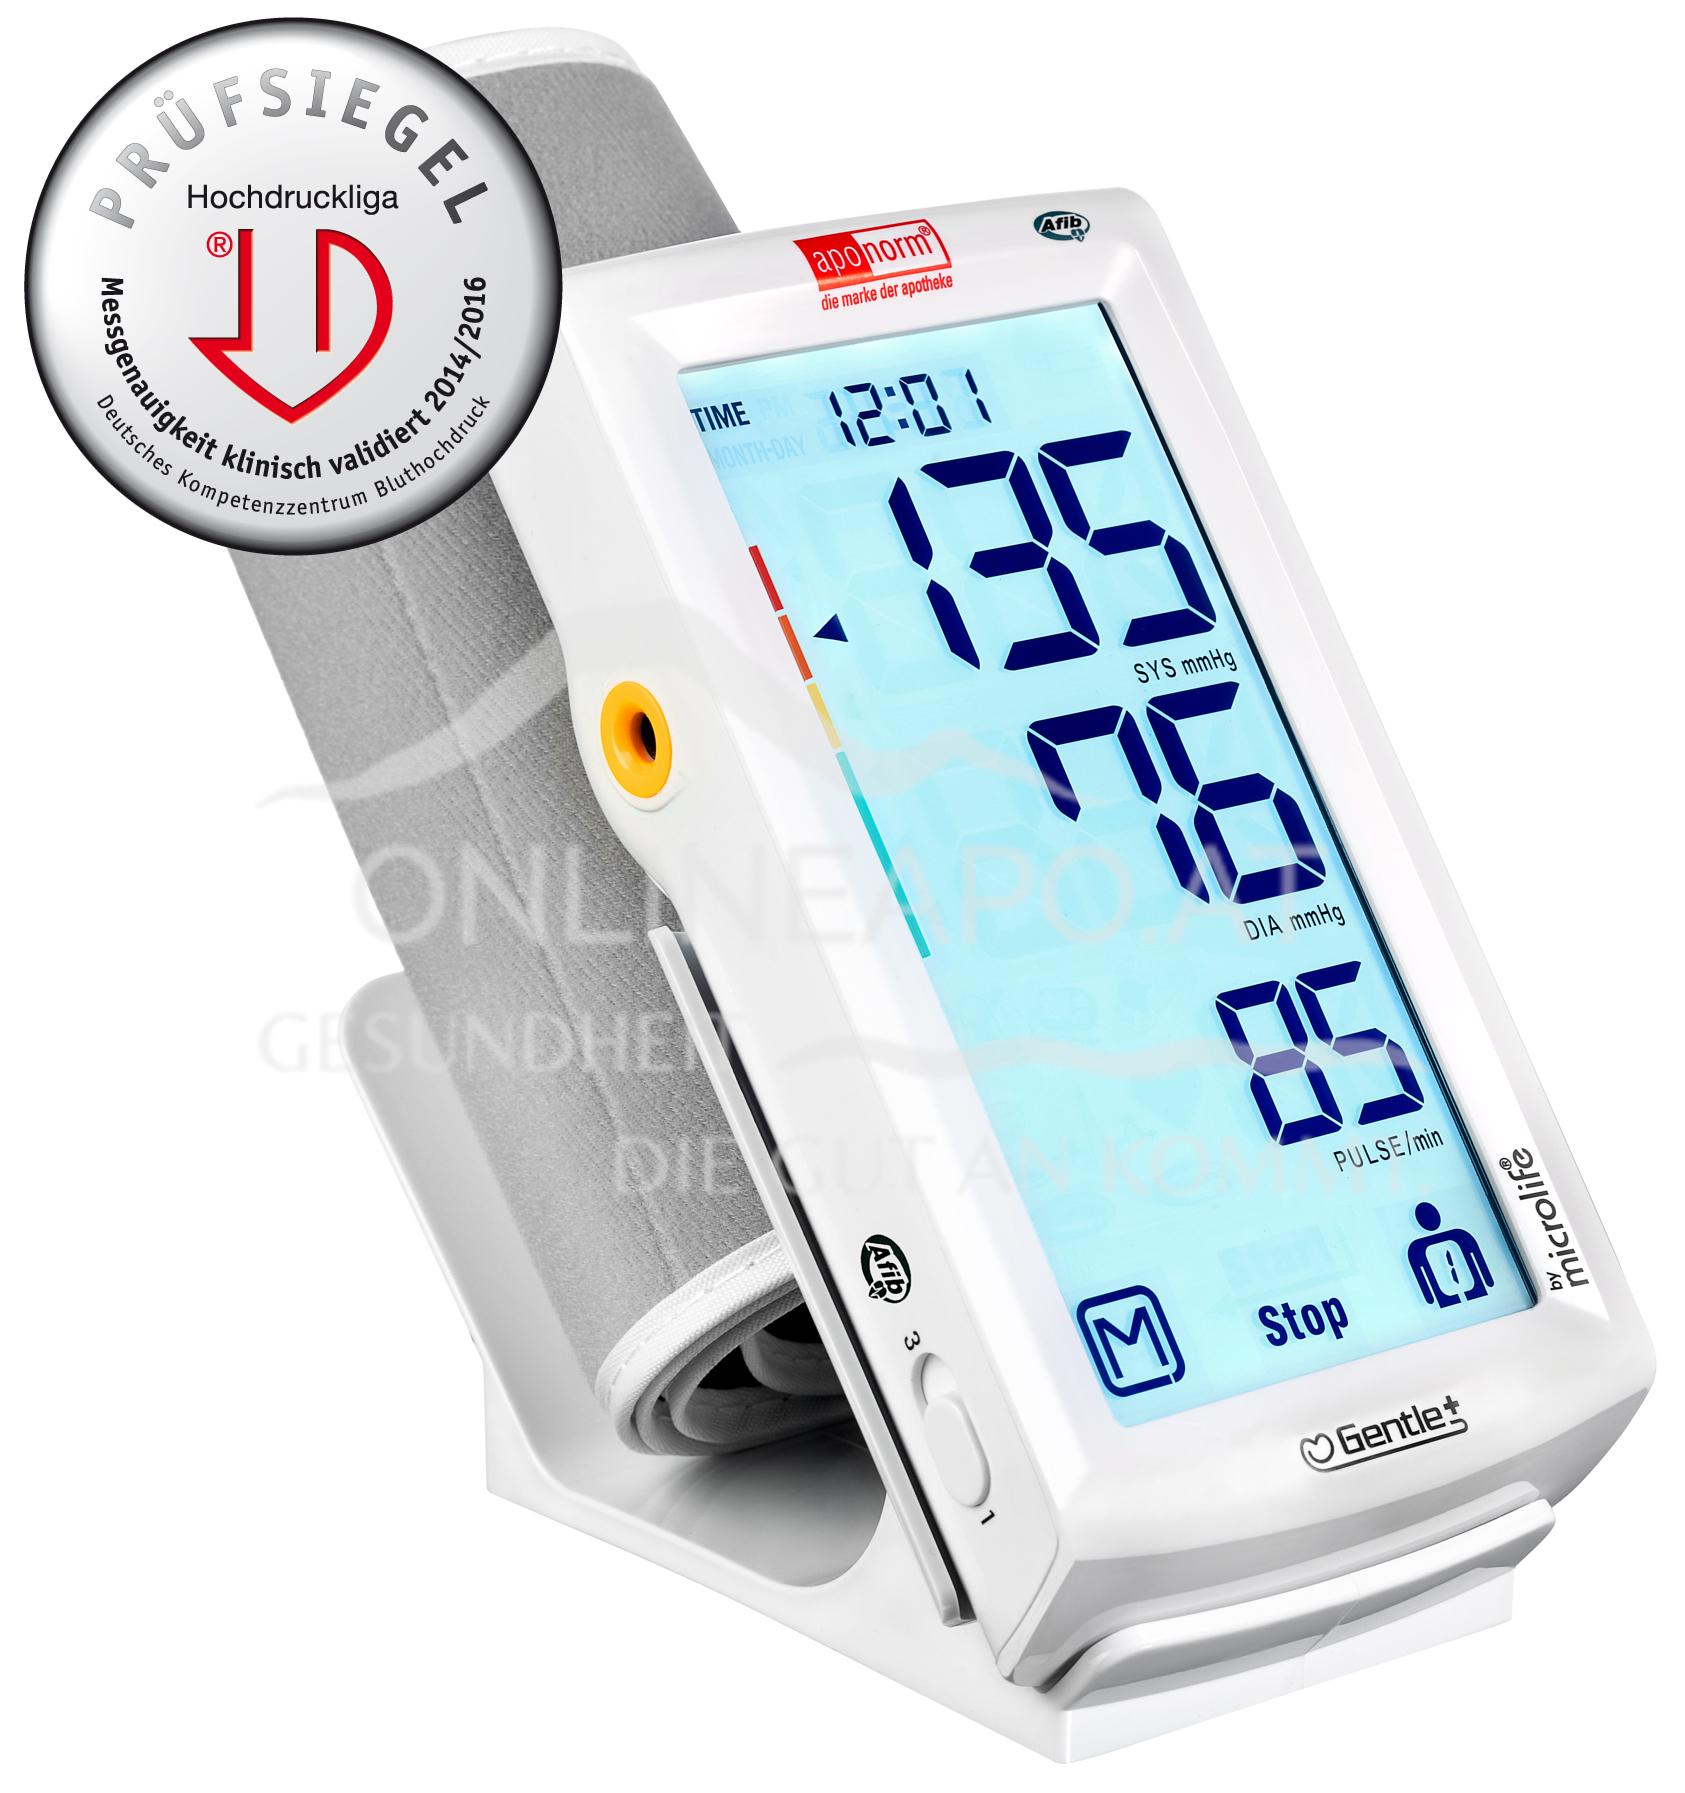 aponorm® Professionell Touch Blutdruckmessgerät